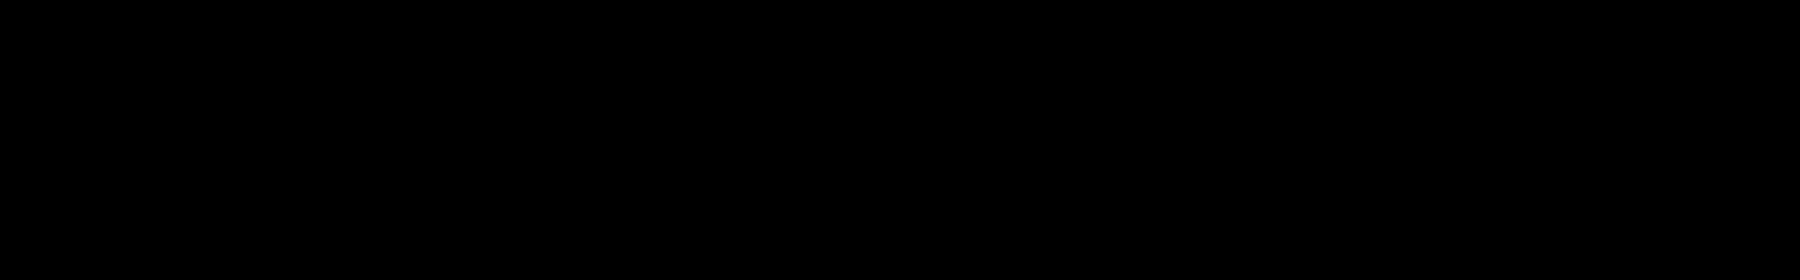 Lofi Chill: Serum X Cthulhu audio waveform